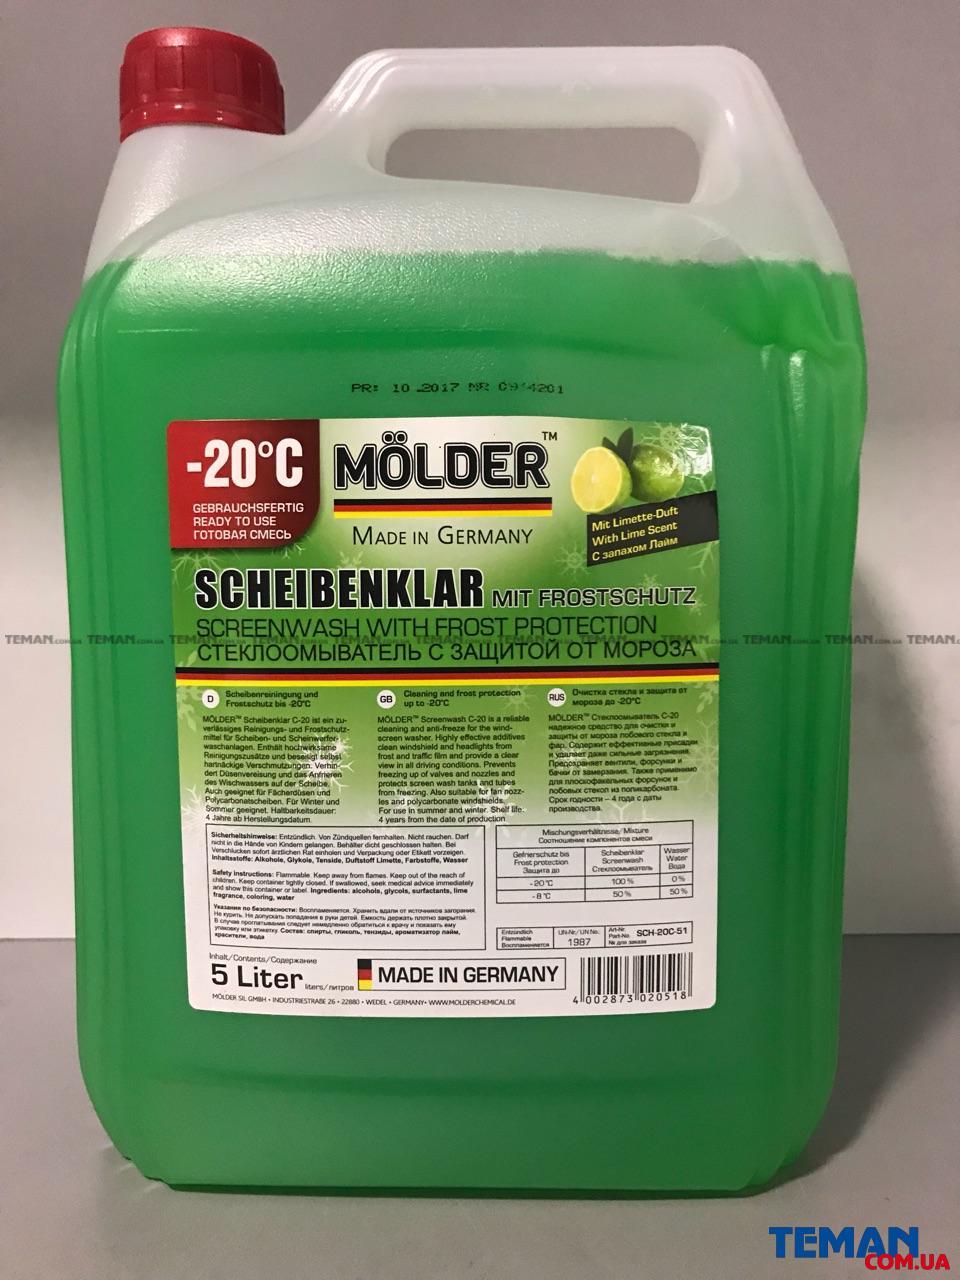 Купить  MOLDER Scheibenklar Screenwash With Frost Protection LIME 5L, -20*СMOLDER sch20c51